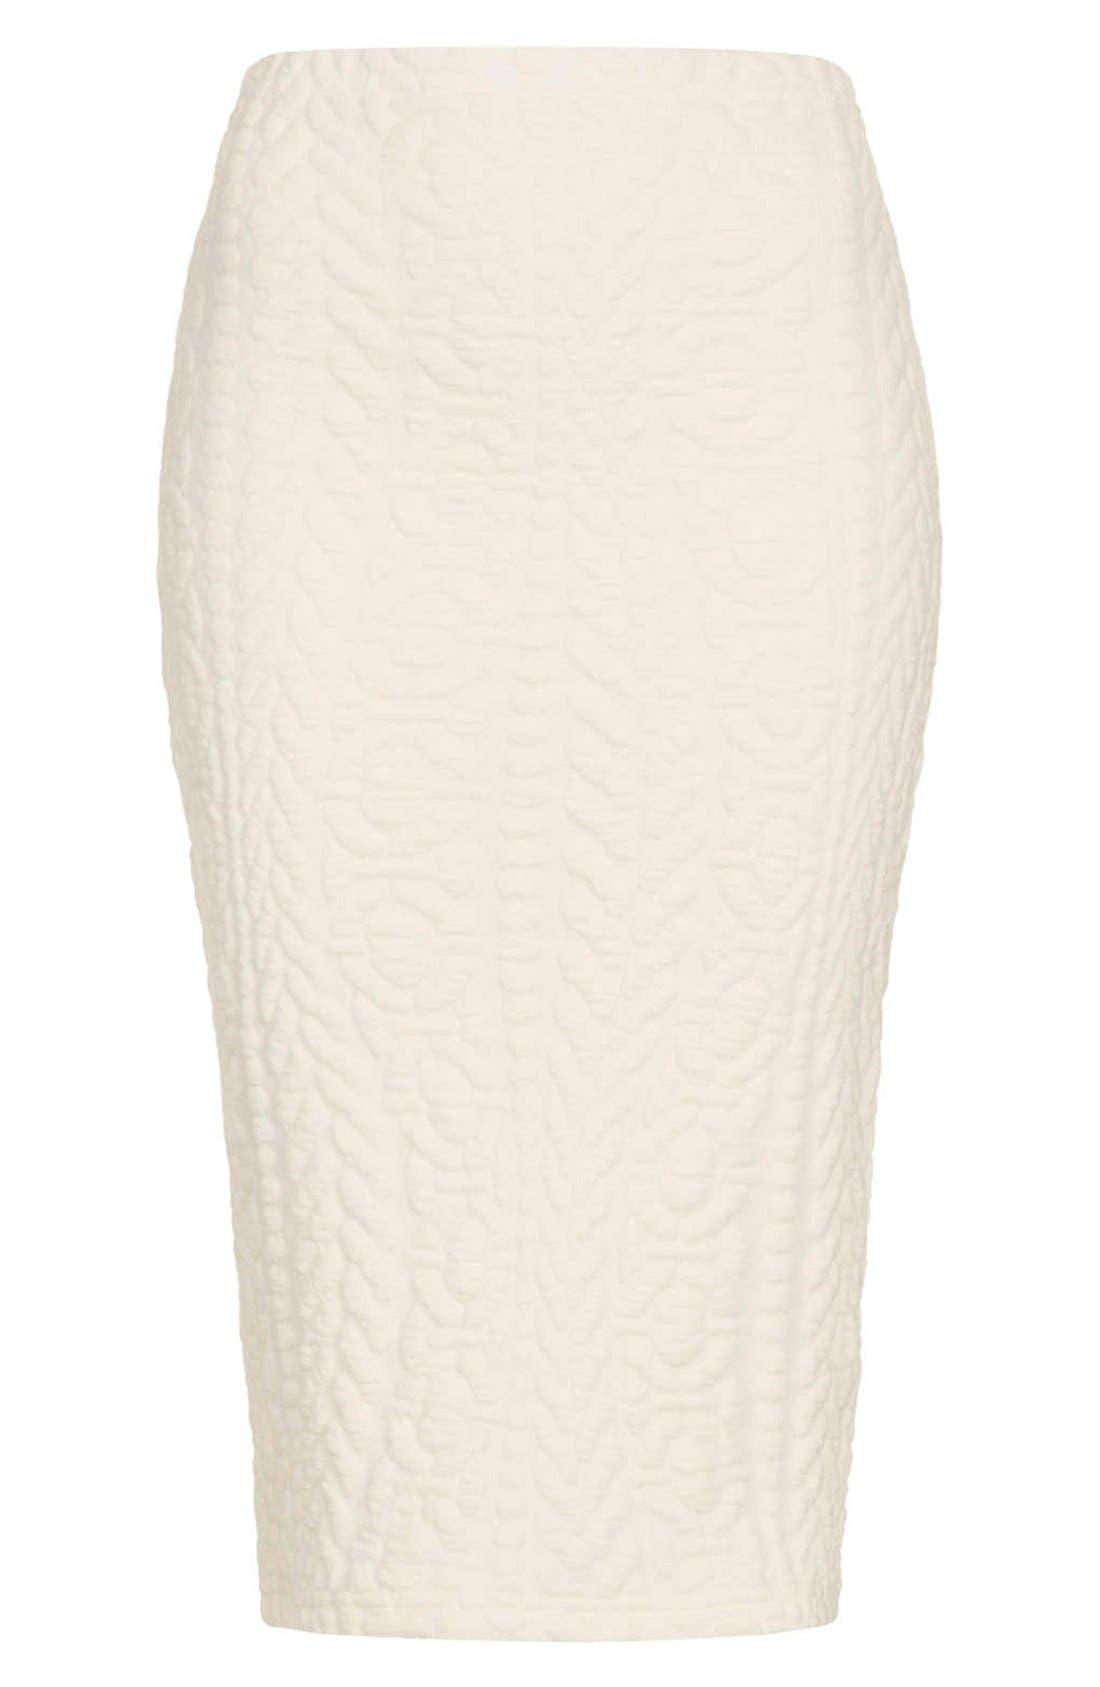 Alternate Image 3  - Topshop Jacquard Tube Skirt